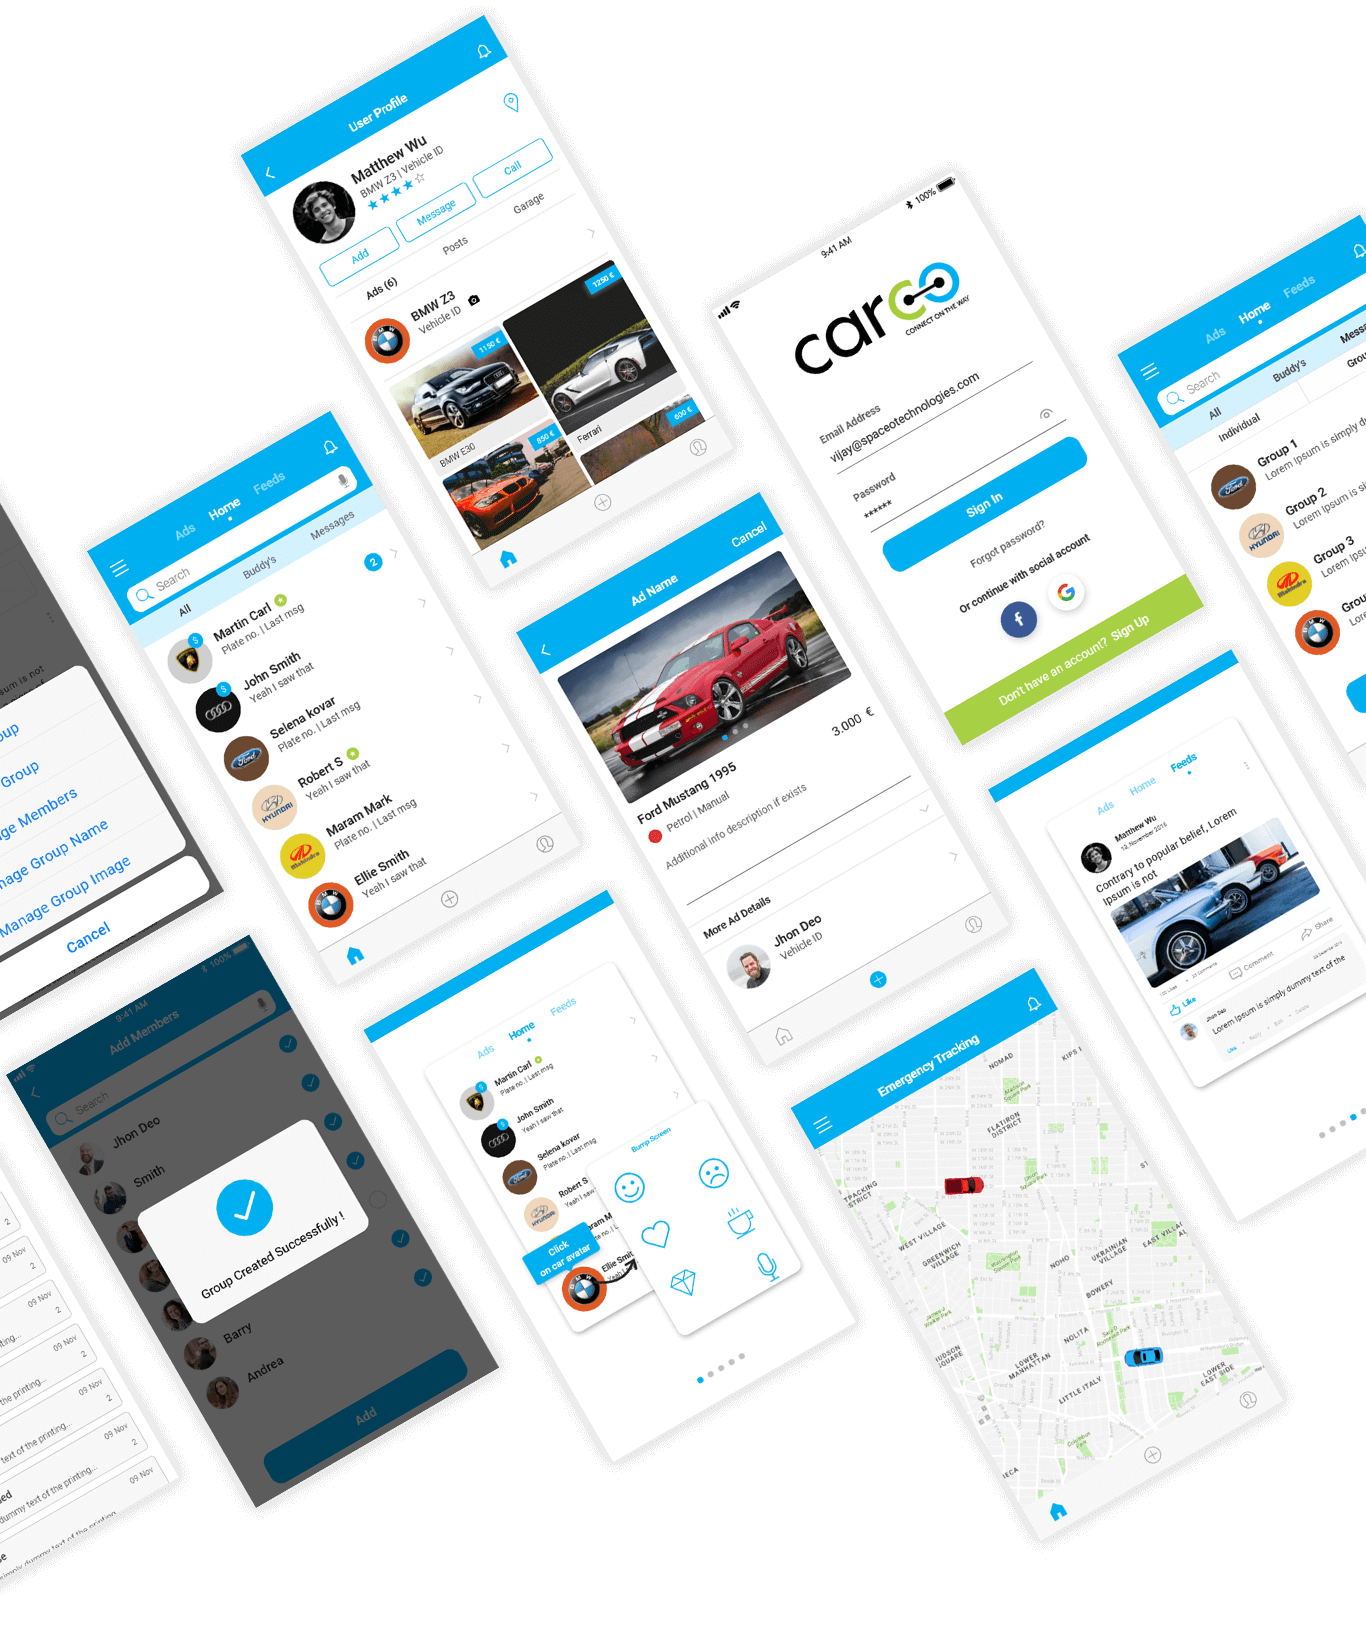 Carco app final interface